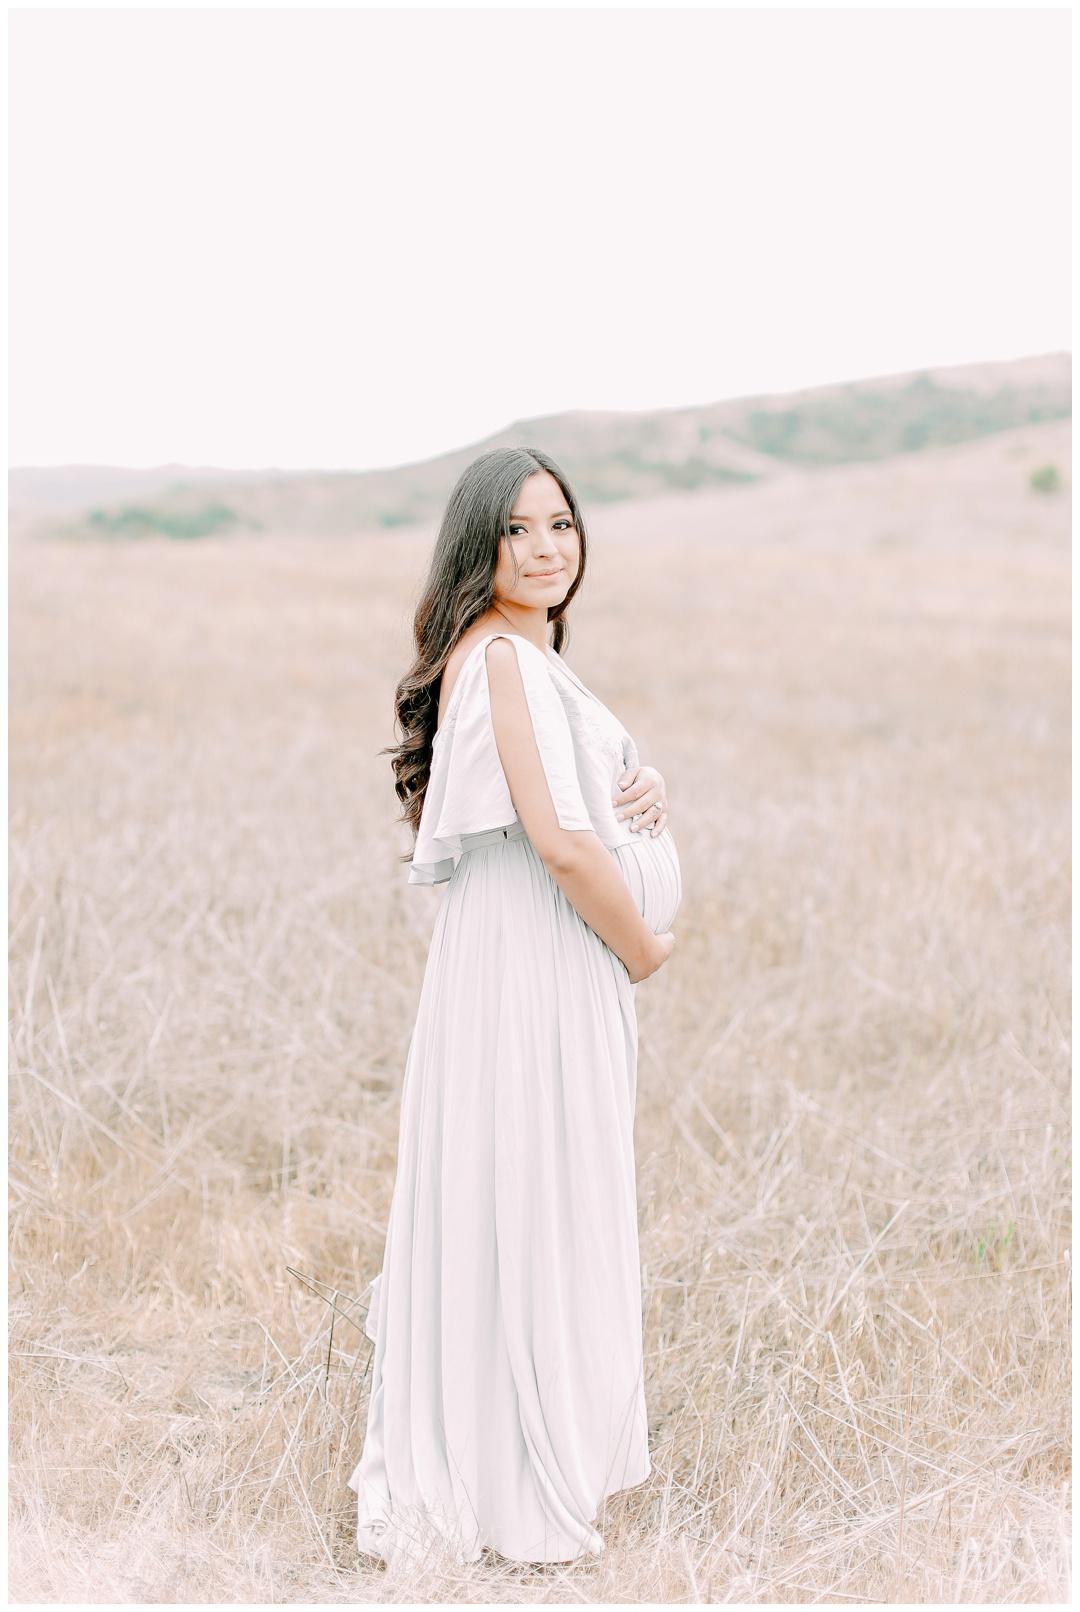 Newport_Beach_Maternity_Photographer_Field_Maternity_Photography_Cori_Kleckner_Photography_1064.jpg